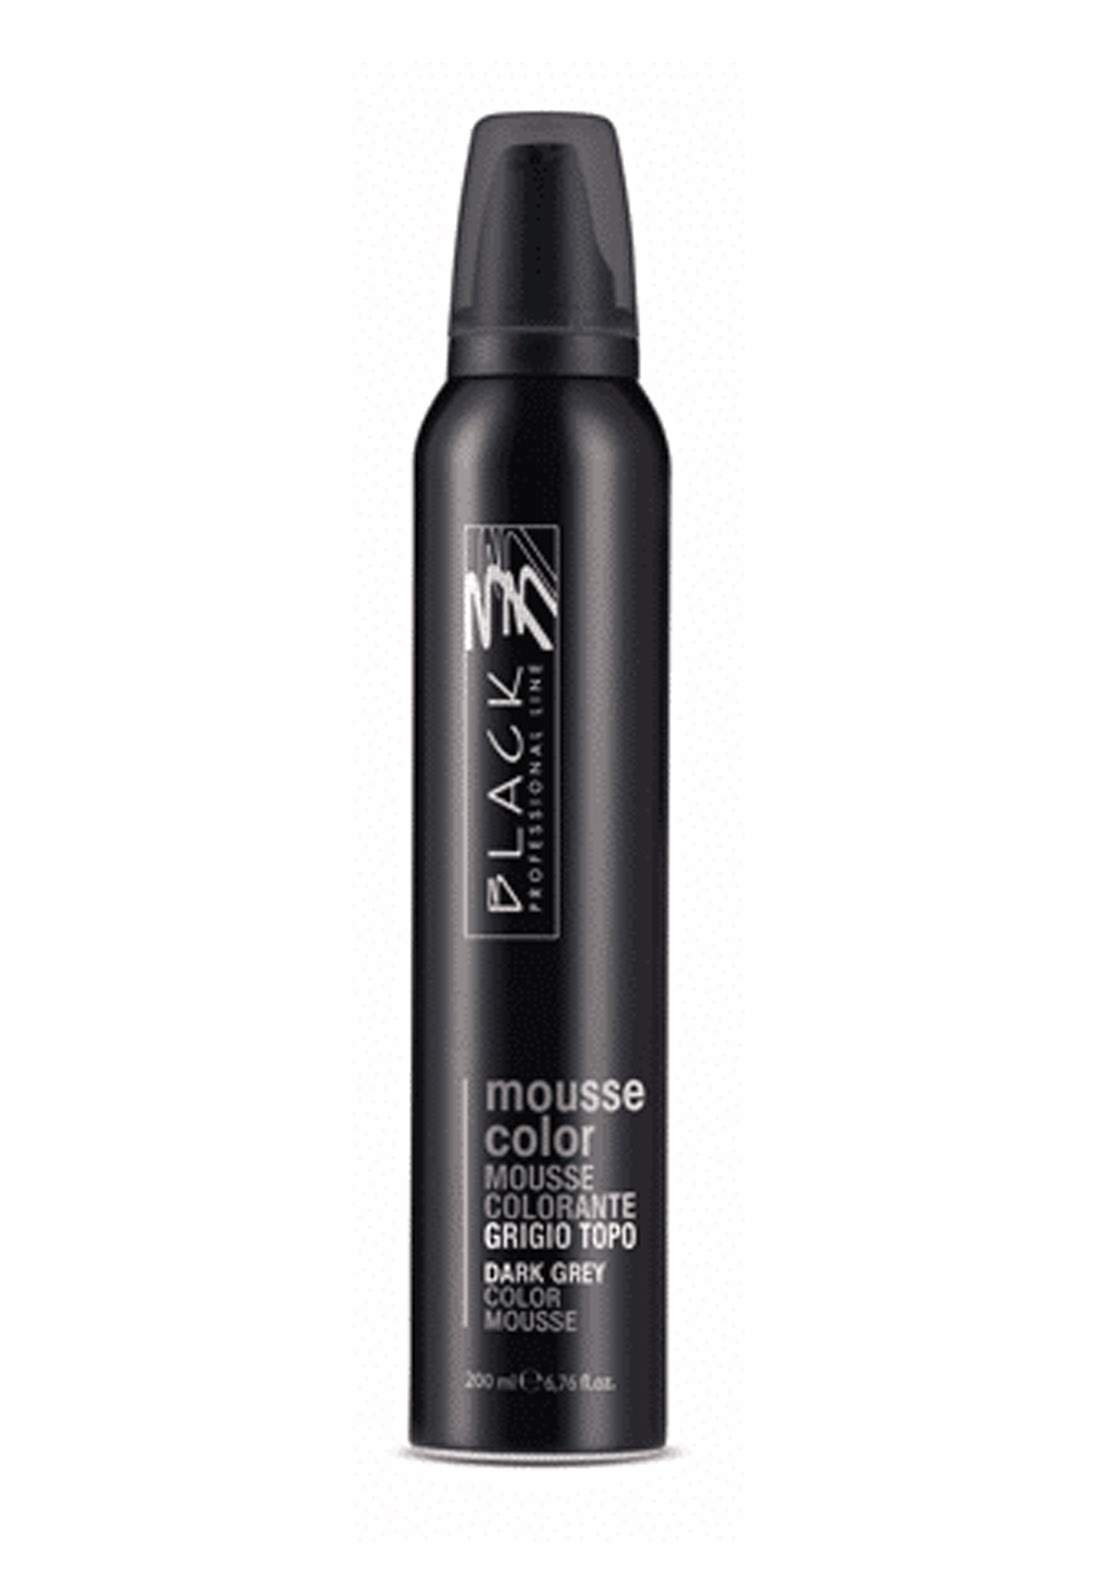 Black Mousse Color Protective Coloring 200ml Dark Grey  موس حماية اللون